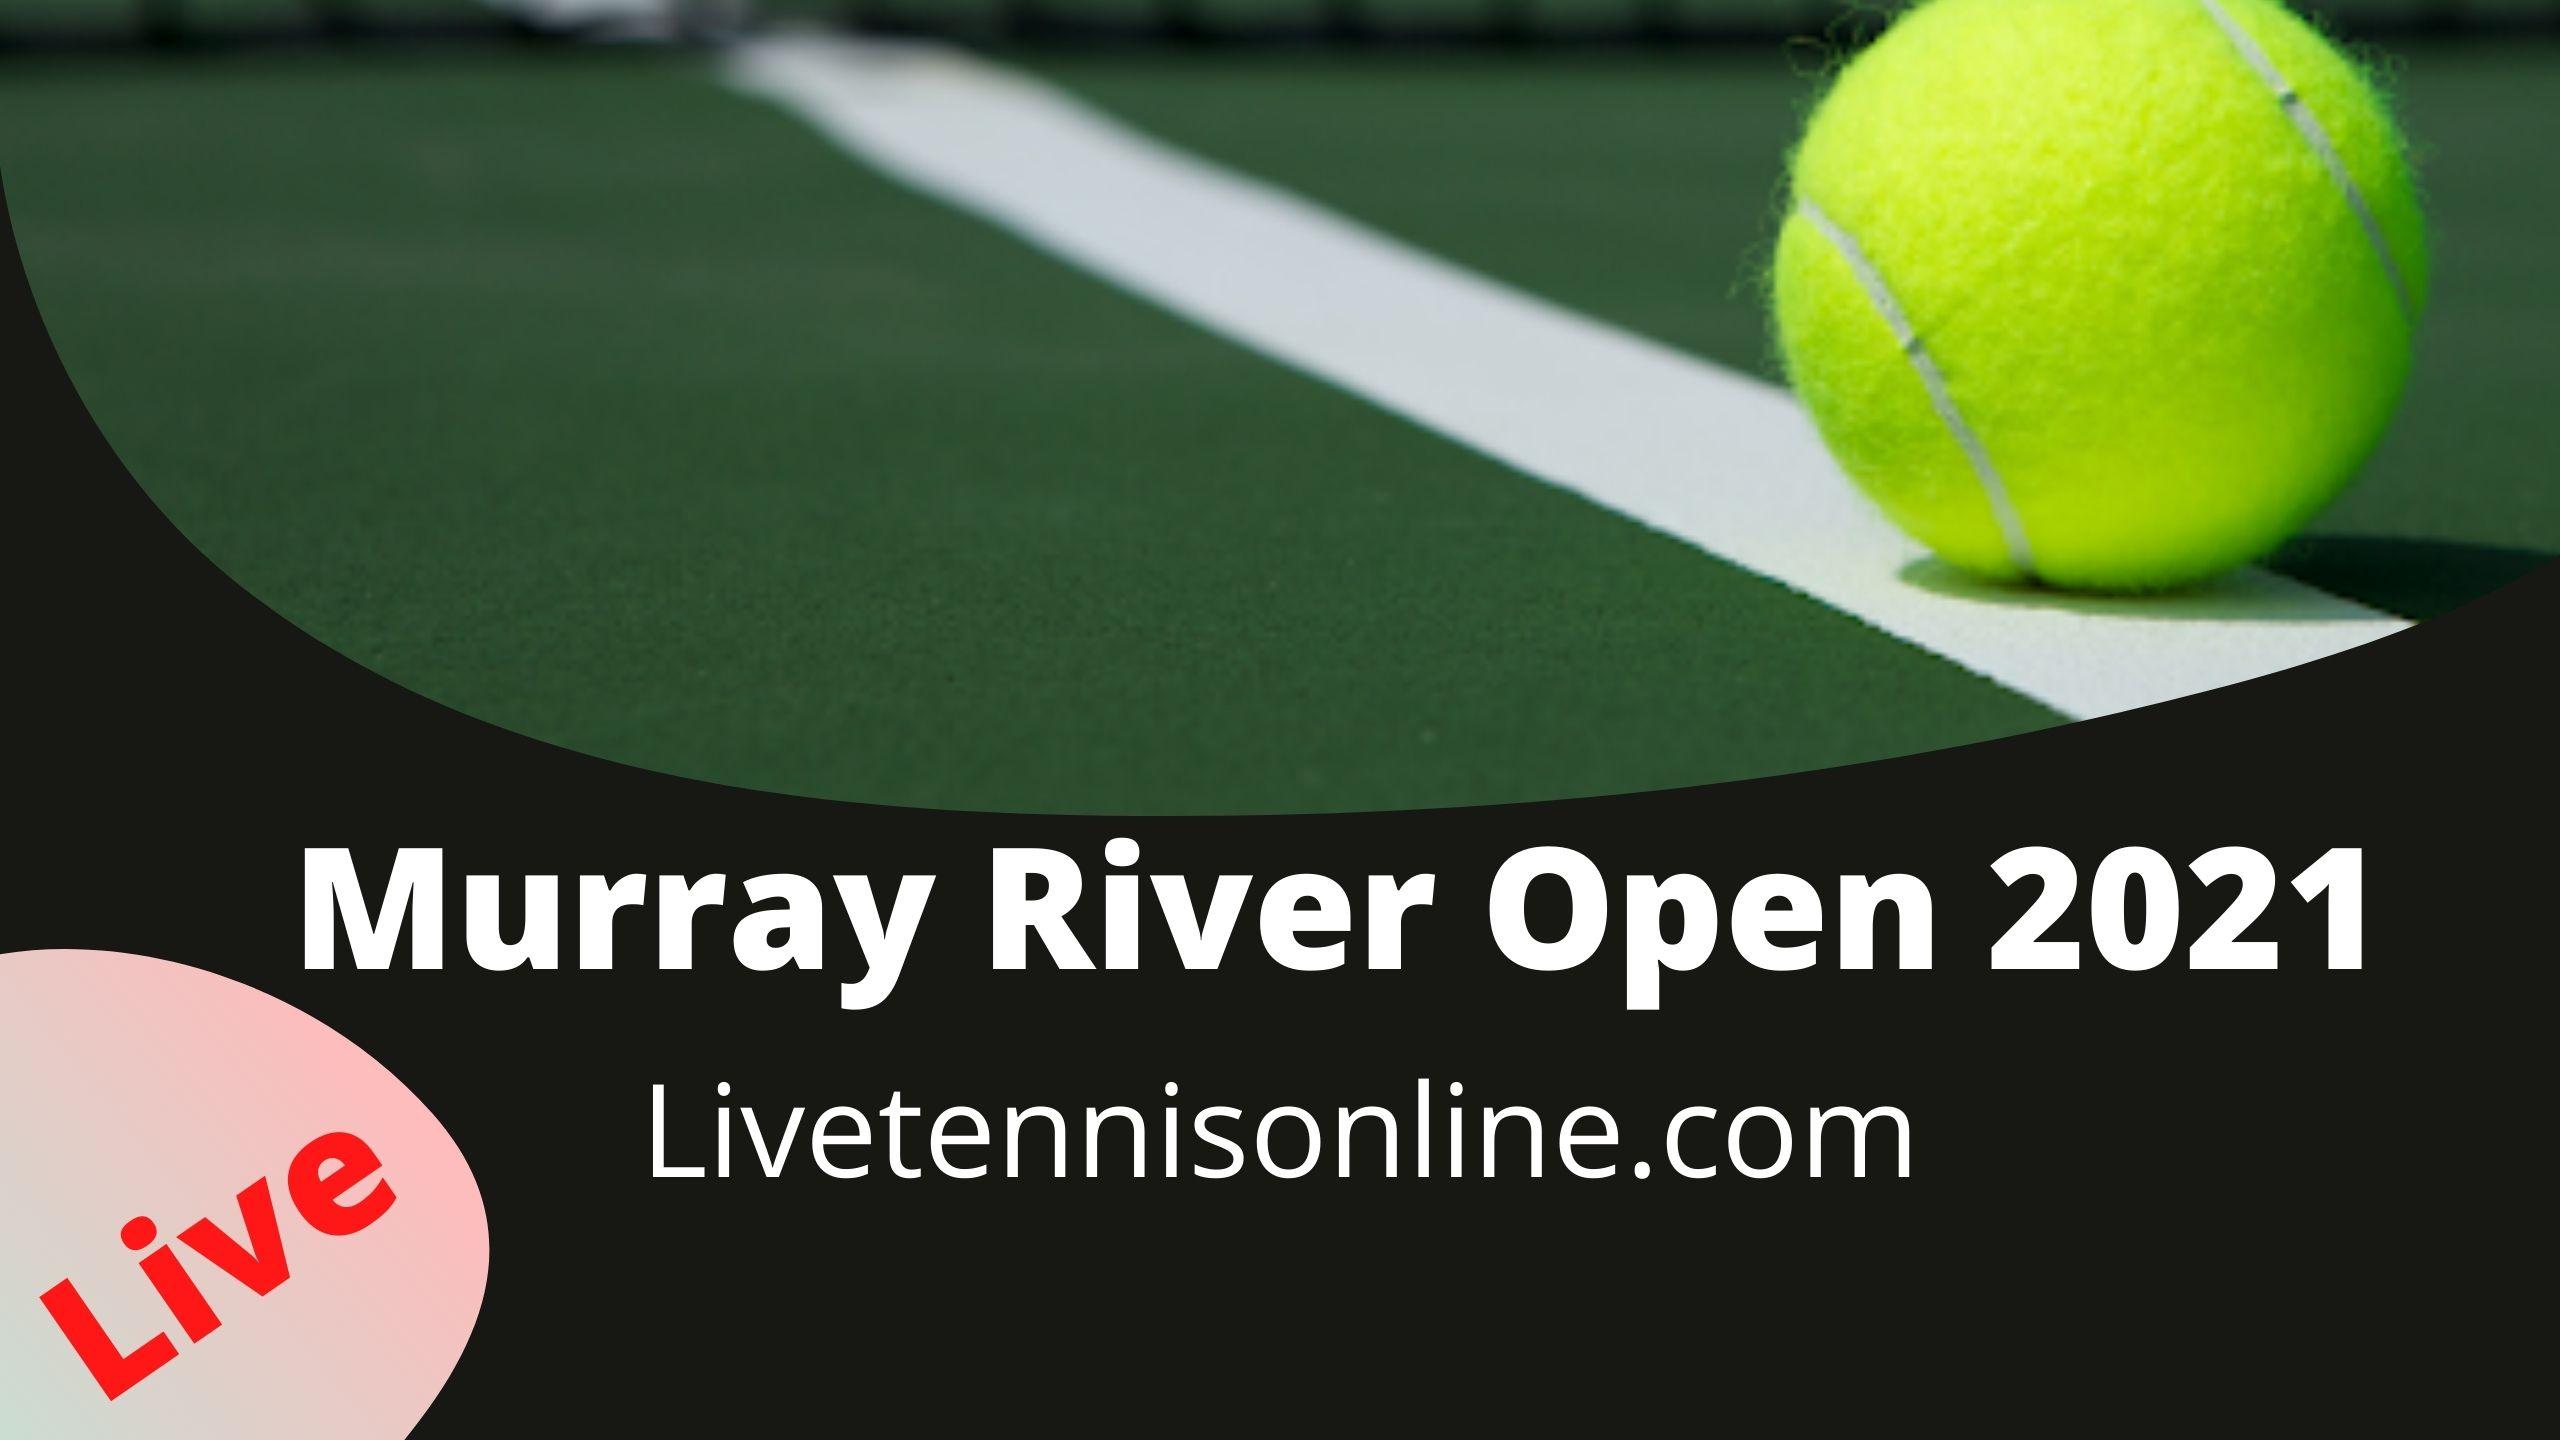 Wimbledon 2021 Live Streaming